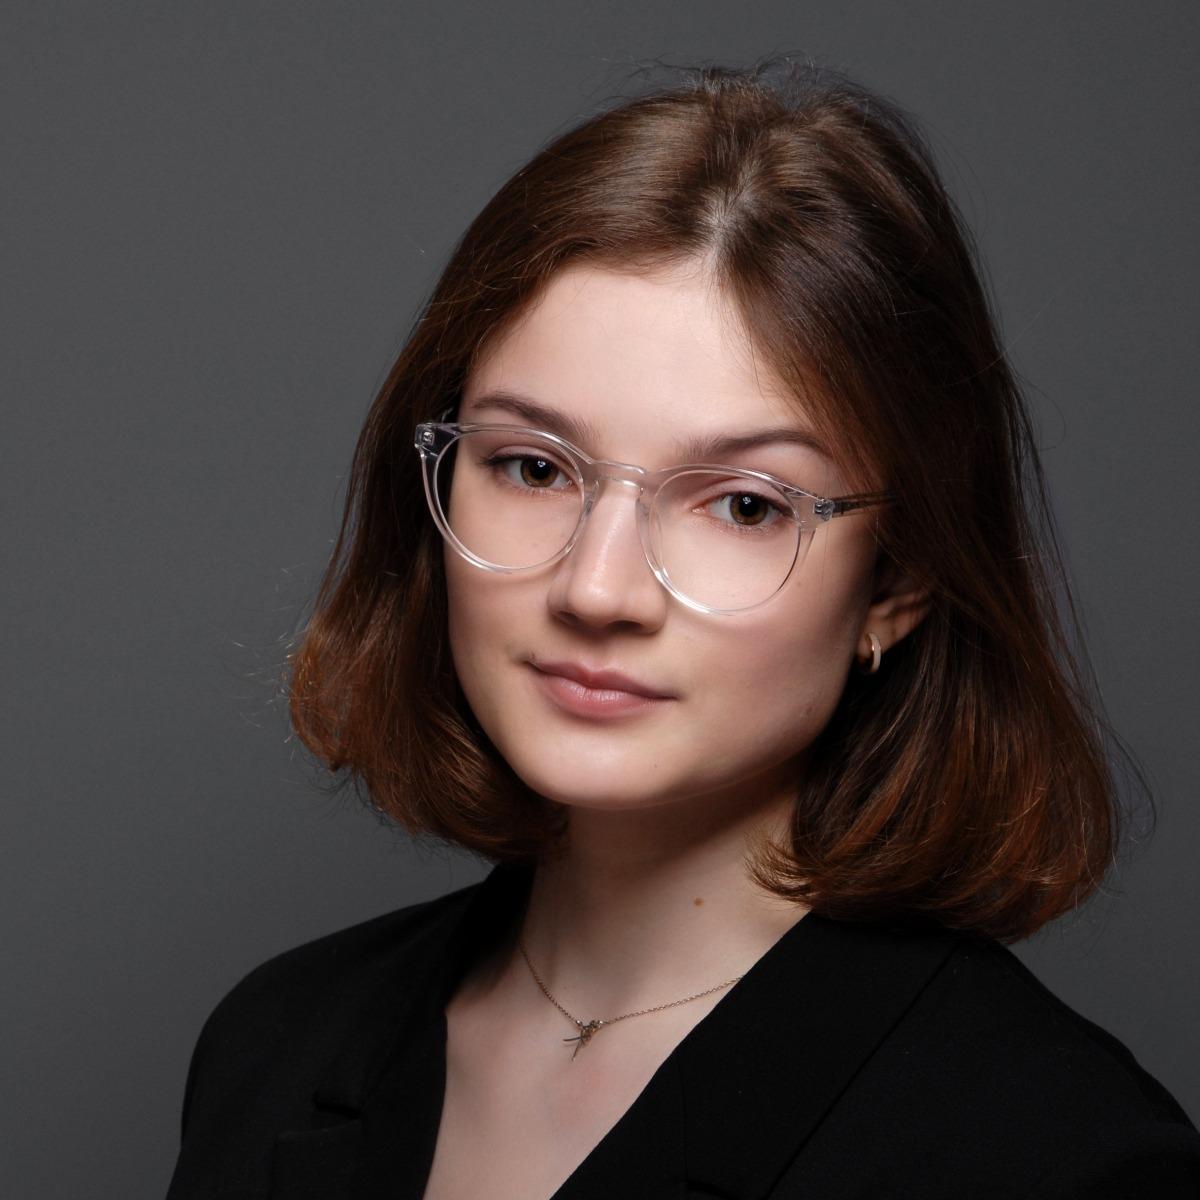 Natalia Klaudia Żędzian